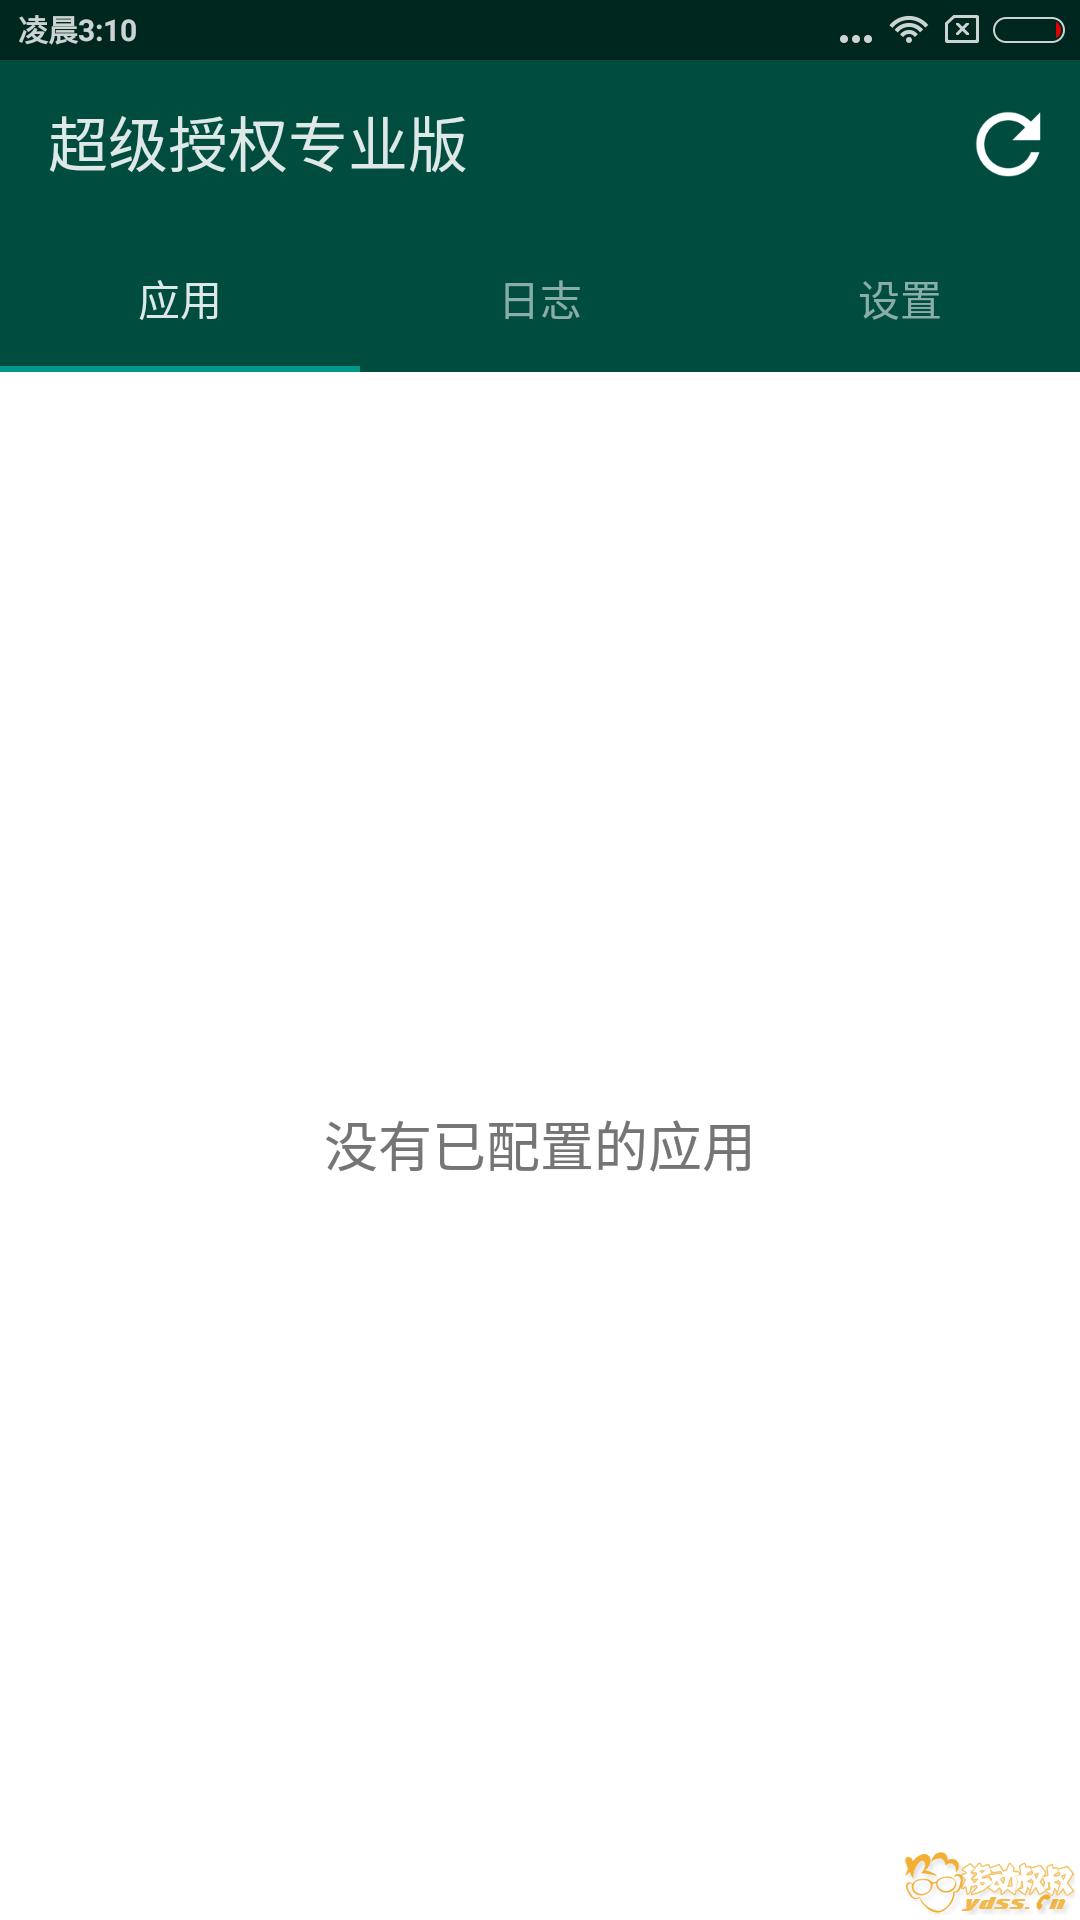 Screenshot_2018-03-11-03-10-33-569_eu.chainfire.s.png